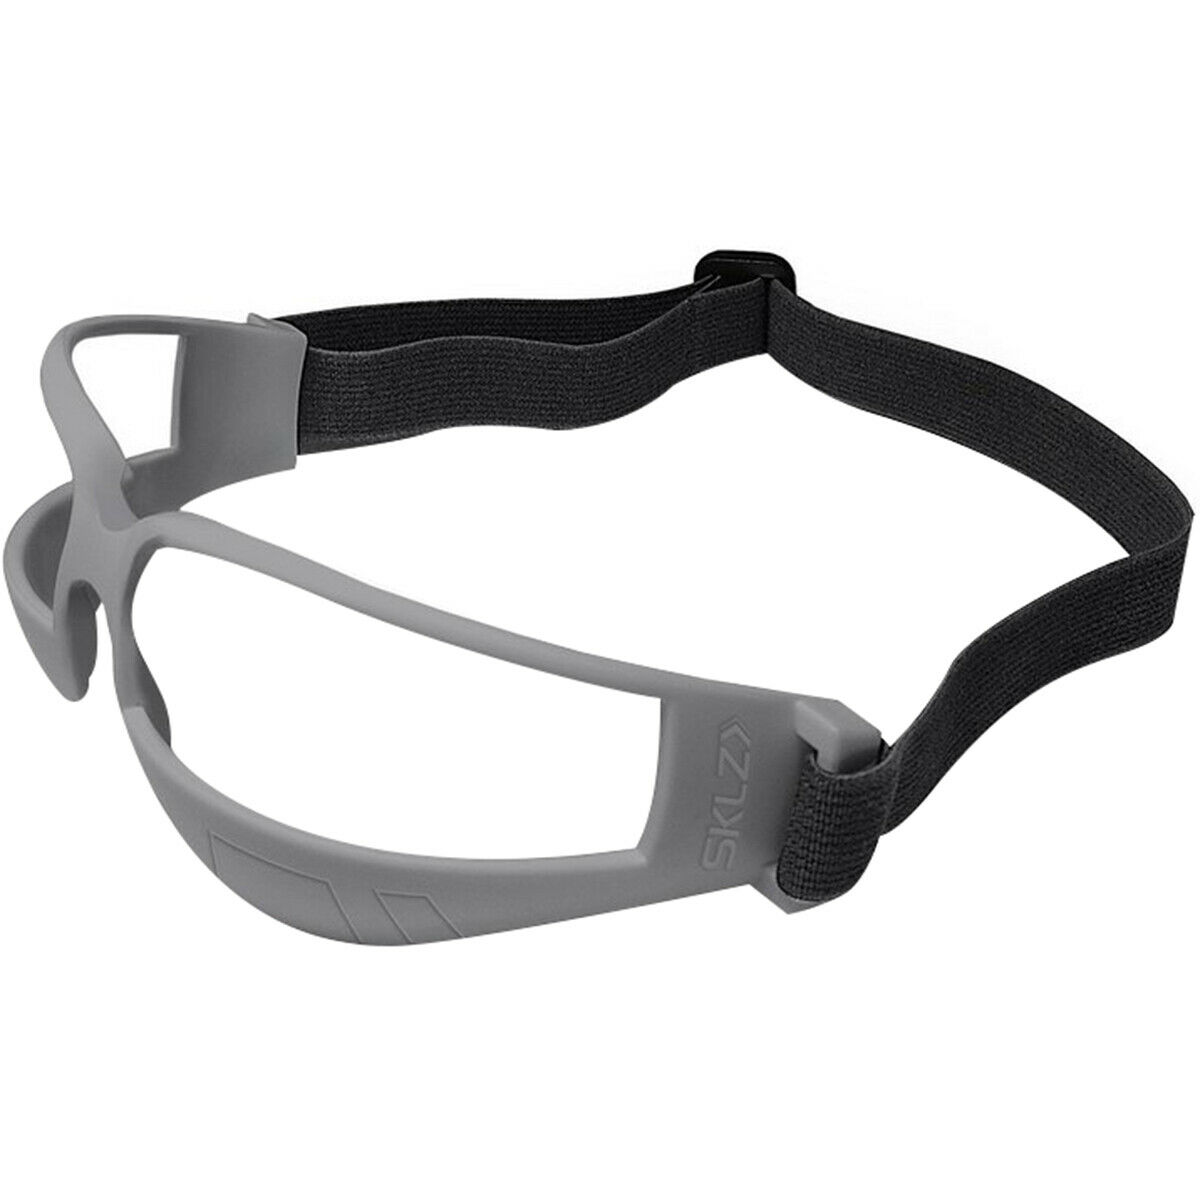 Citar Lógico pérdida  SKLZ Court Vision Basketball Dribble Goggles D1 for sale online | eBay